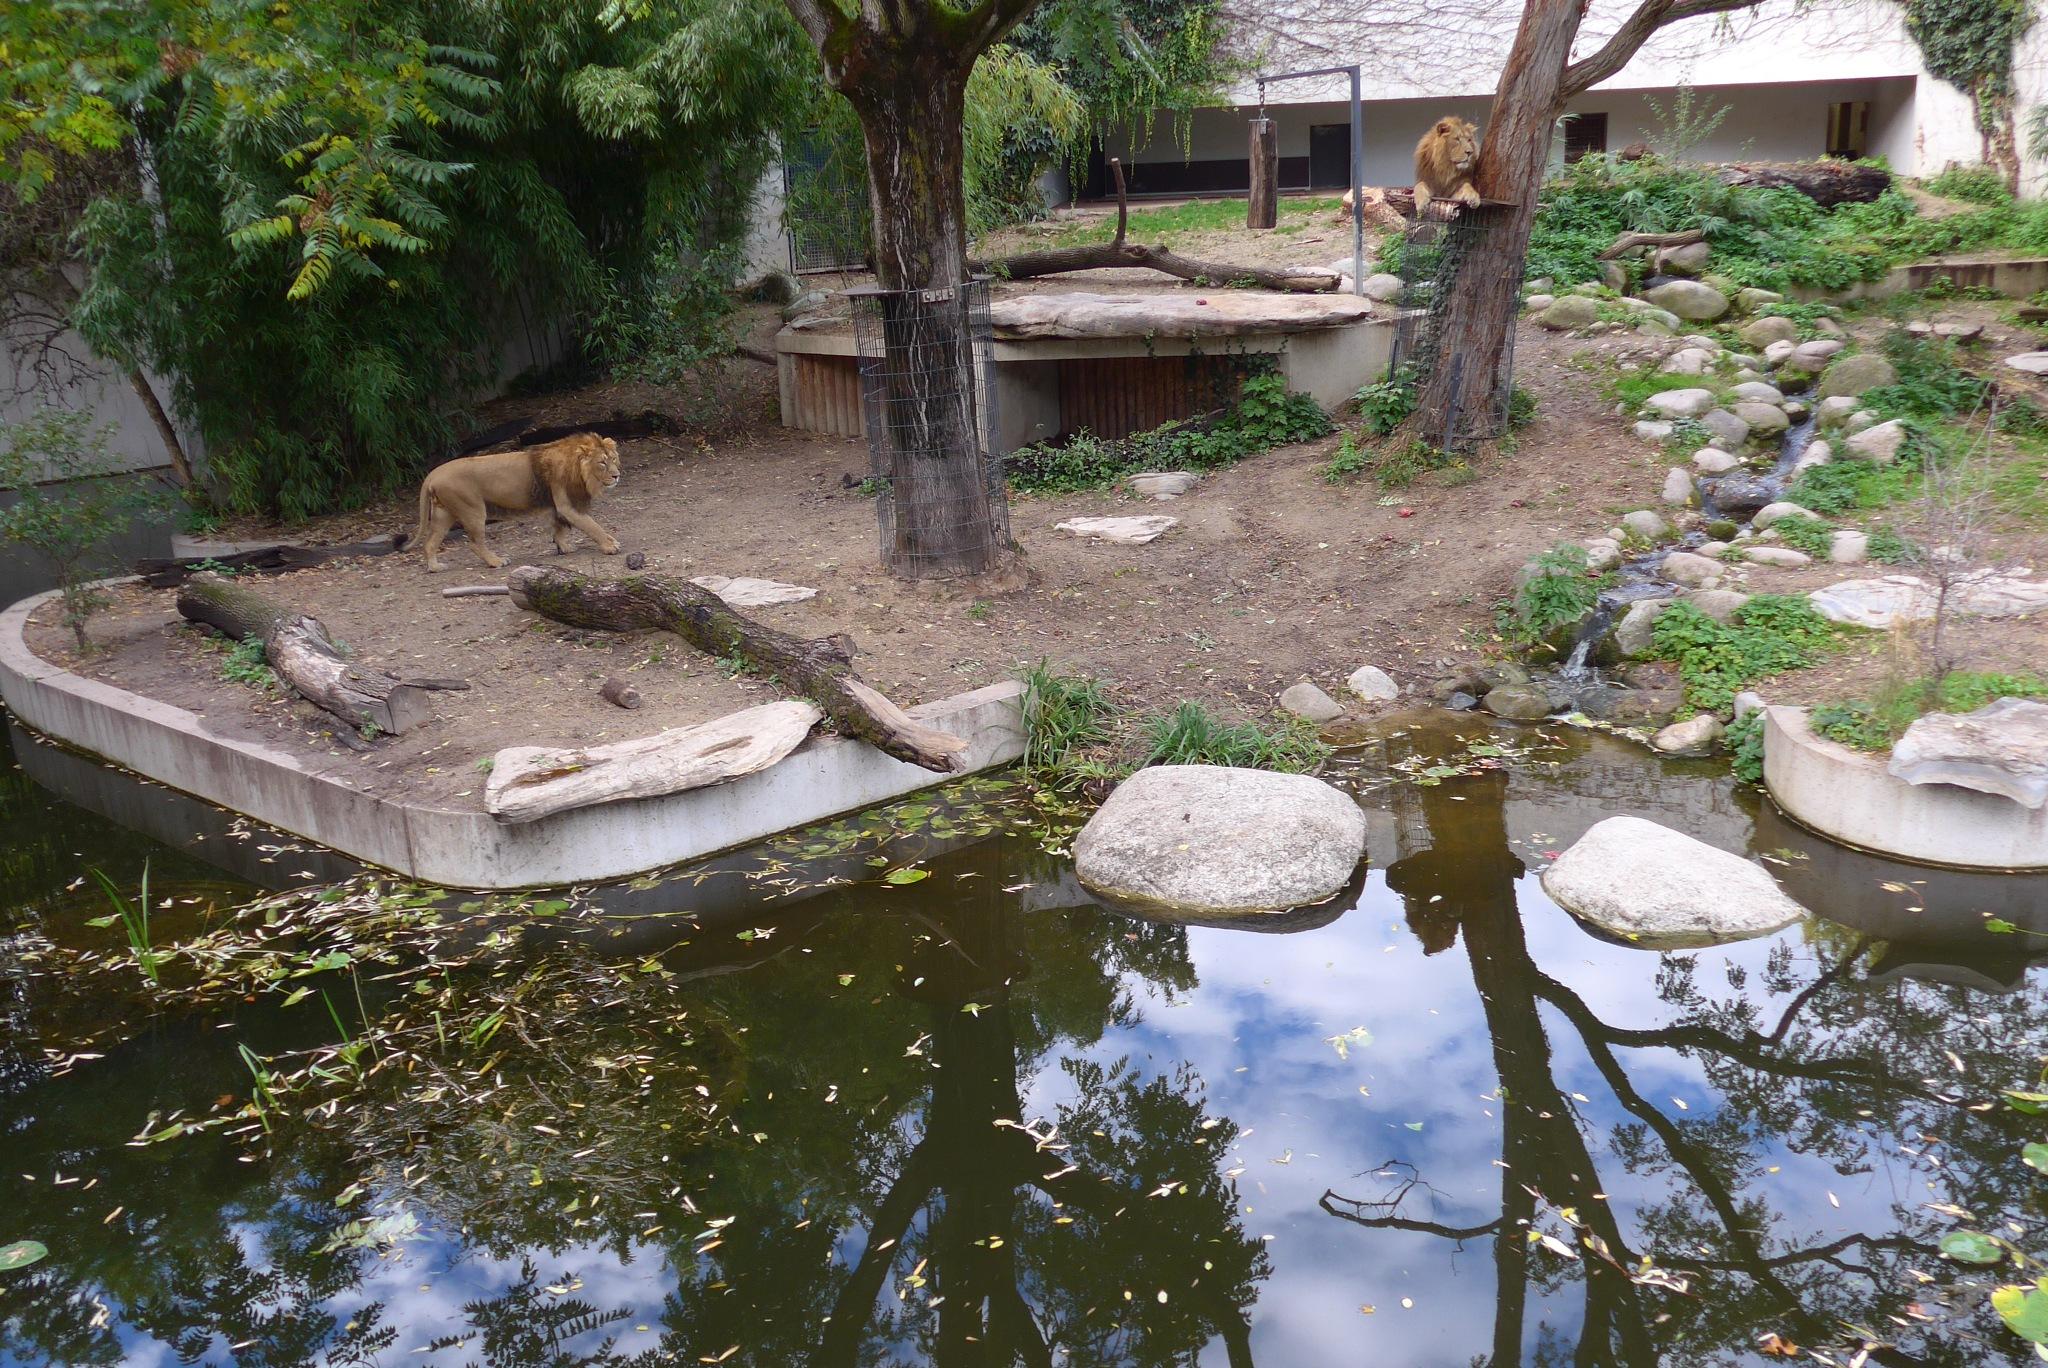 Lions in  Wilhelma Zoo by astarot